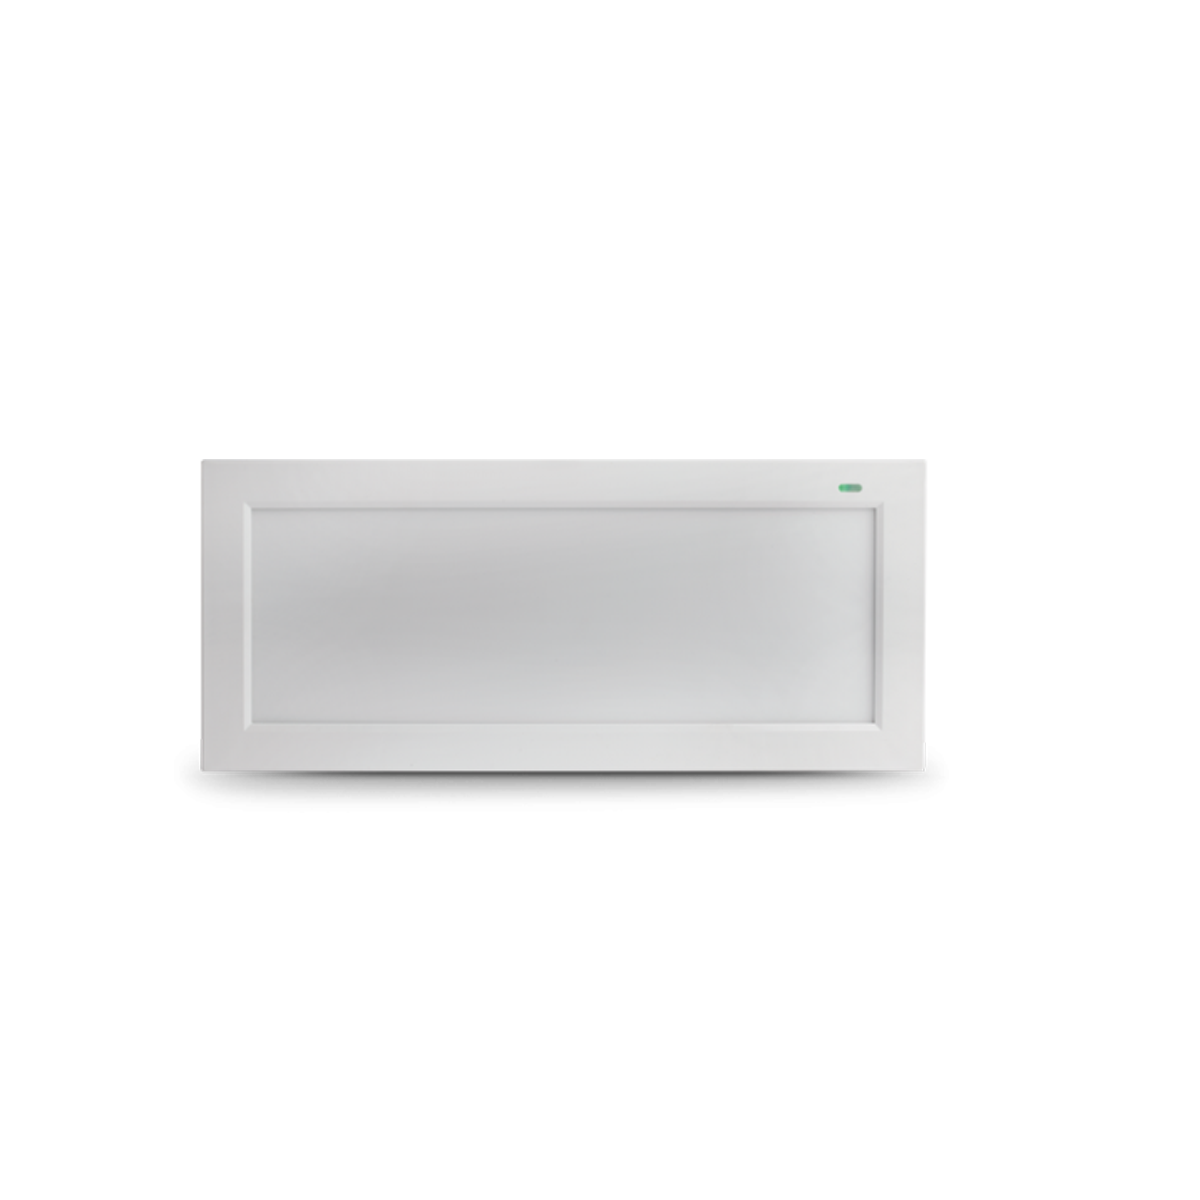 Luz de emergência LED Harper 200 P/NP